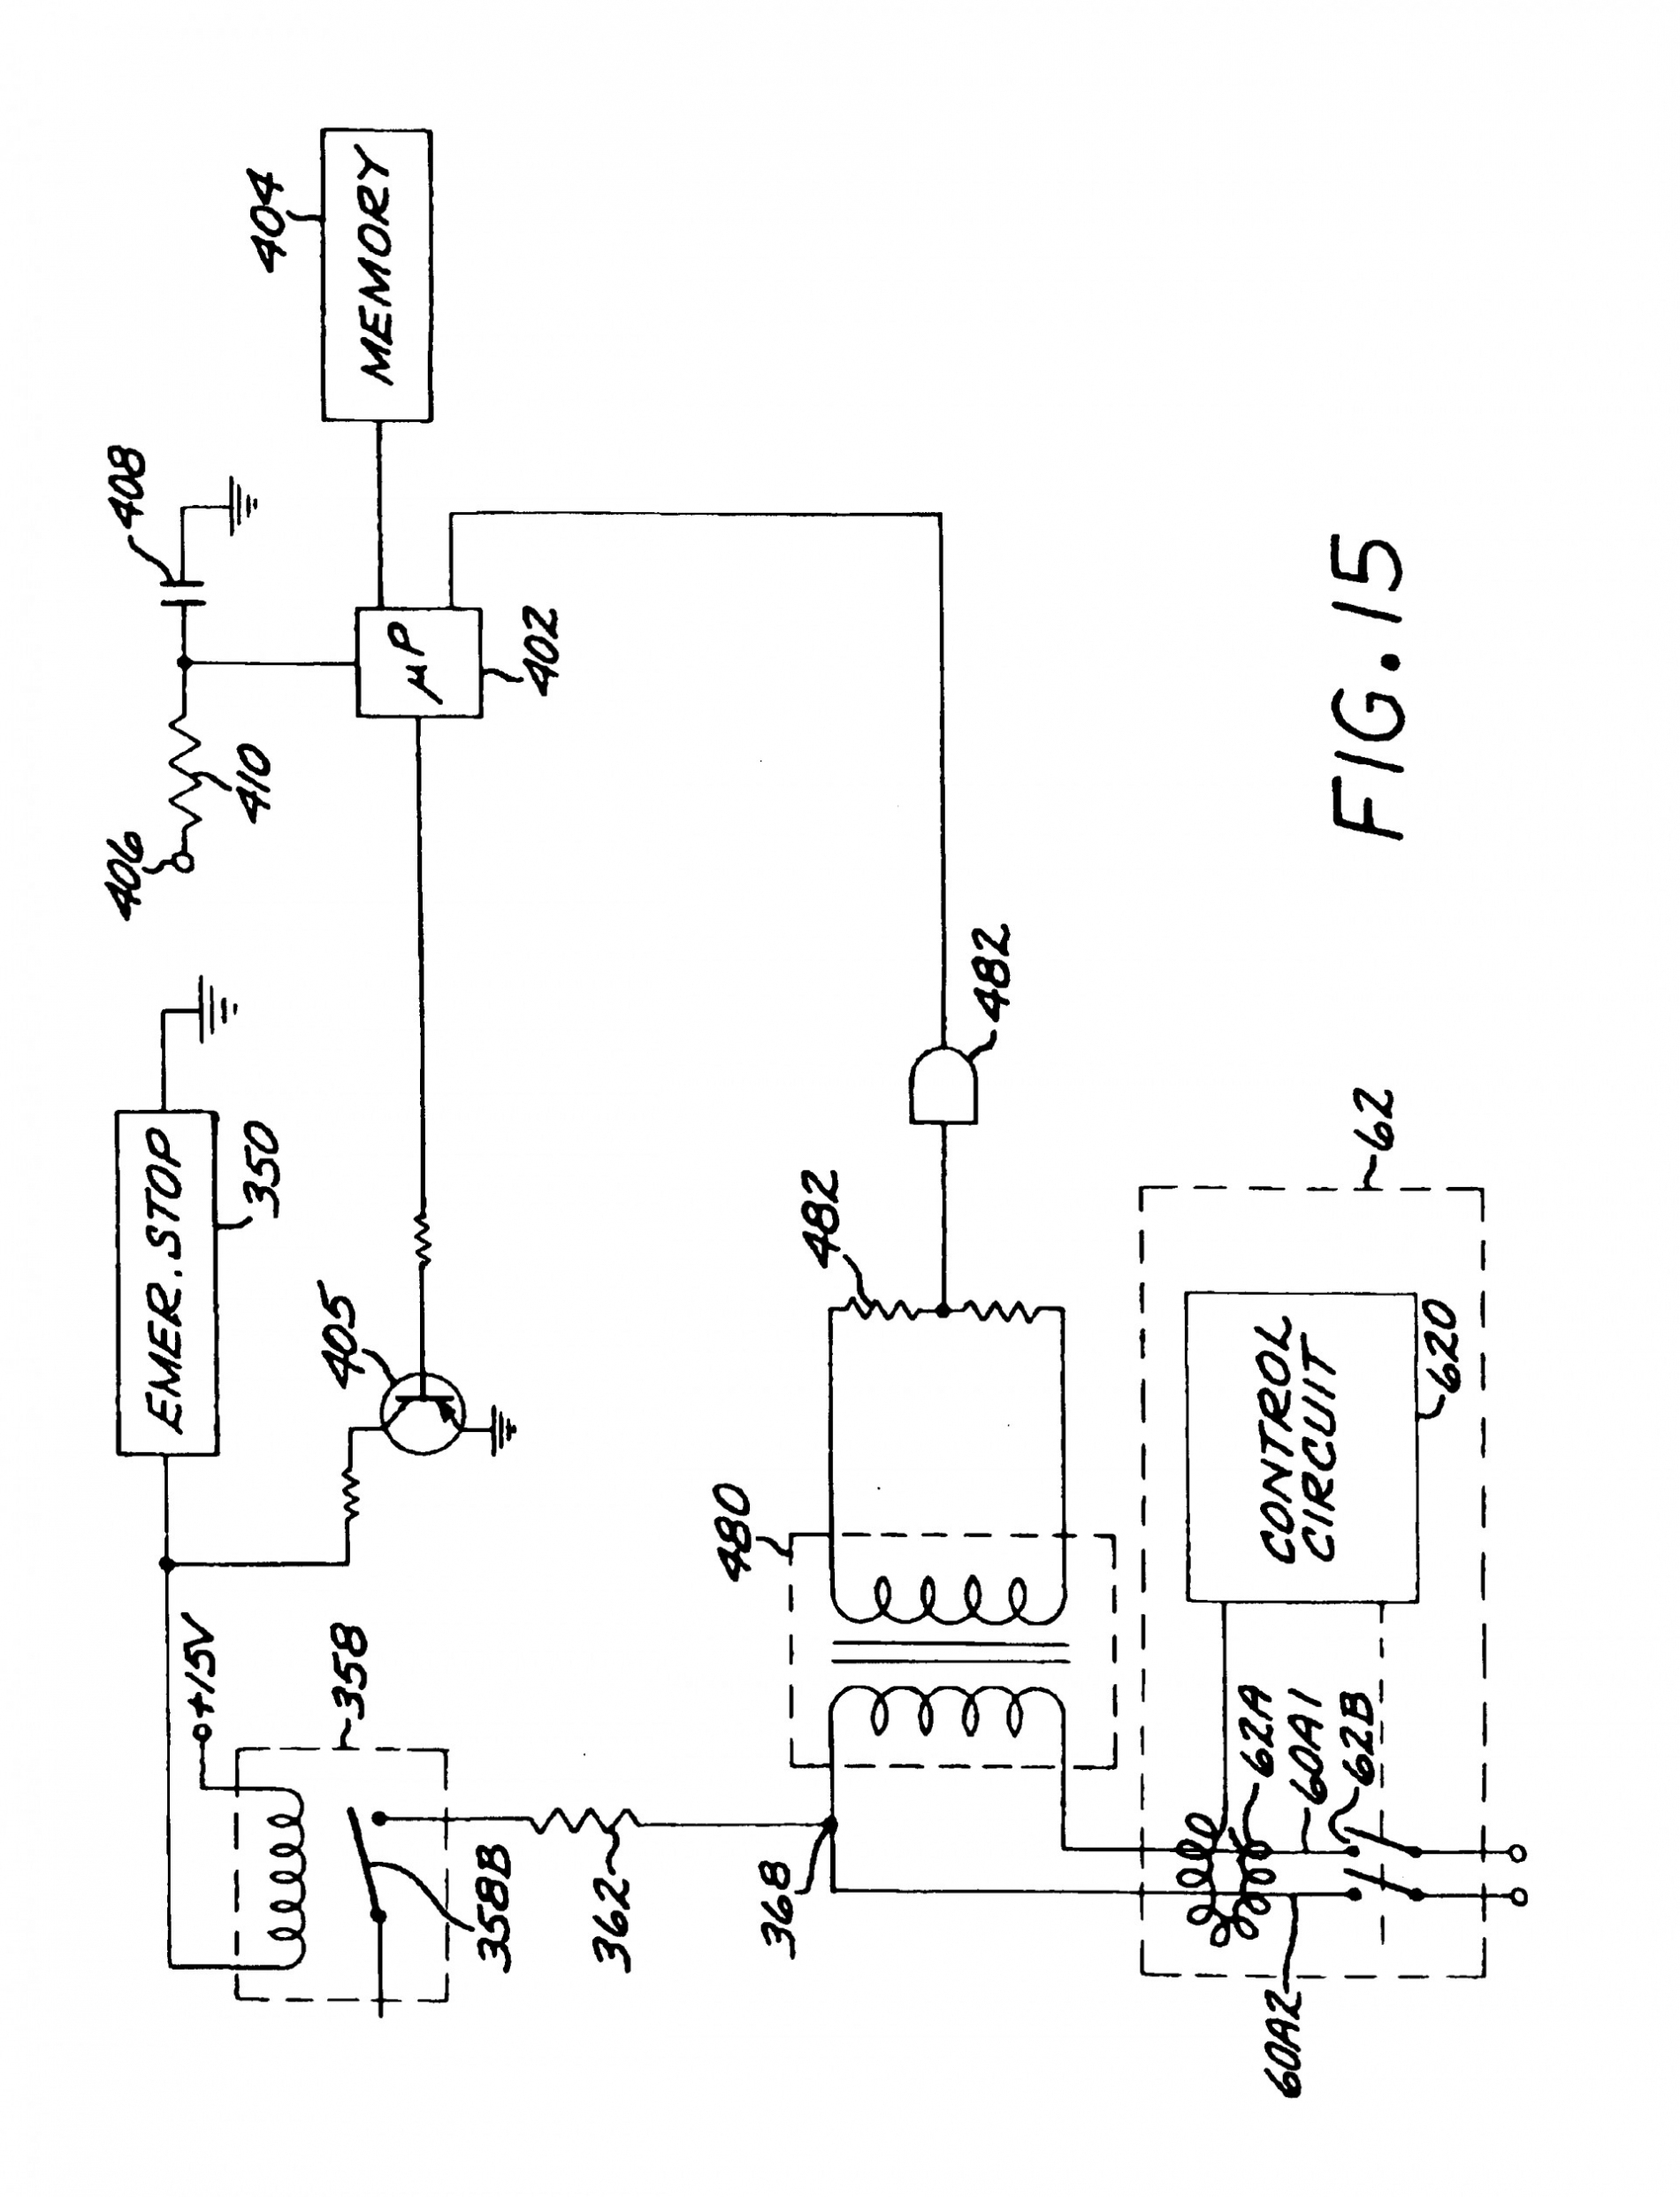 White Rodgers Aquastat Wiring Diagram | Wiring Diagram - White Rodgers Gas Valve Wiring Diagram